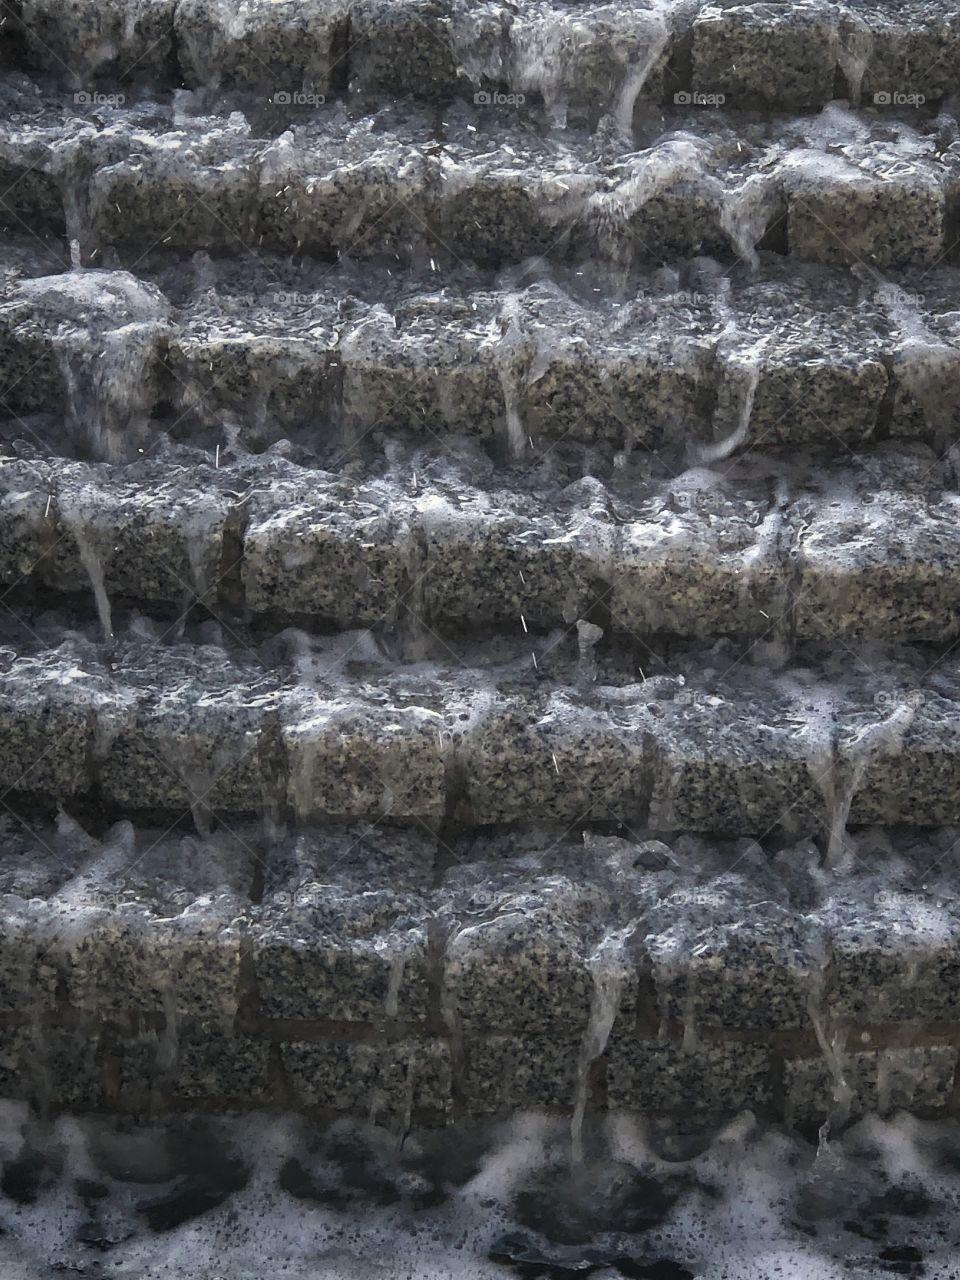 Water Fountain Water Flowing Down Brick Steps